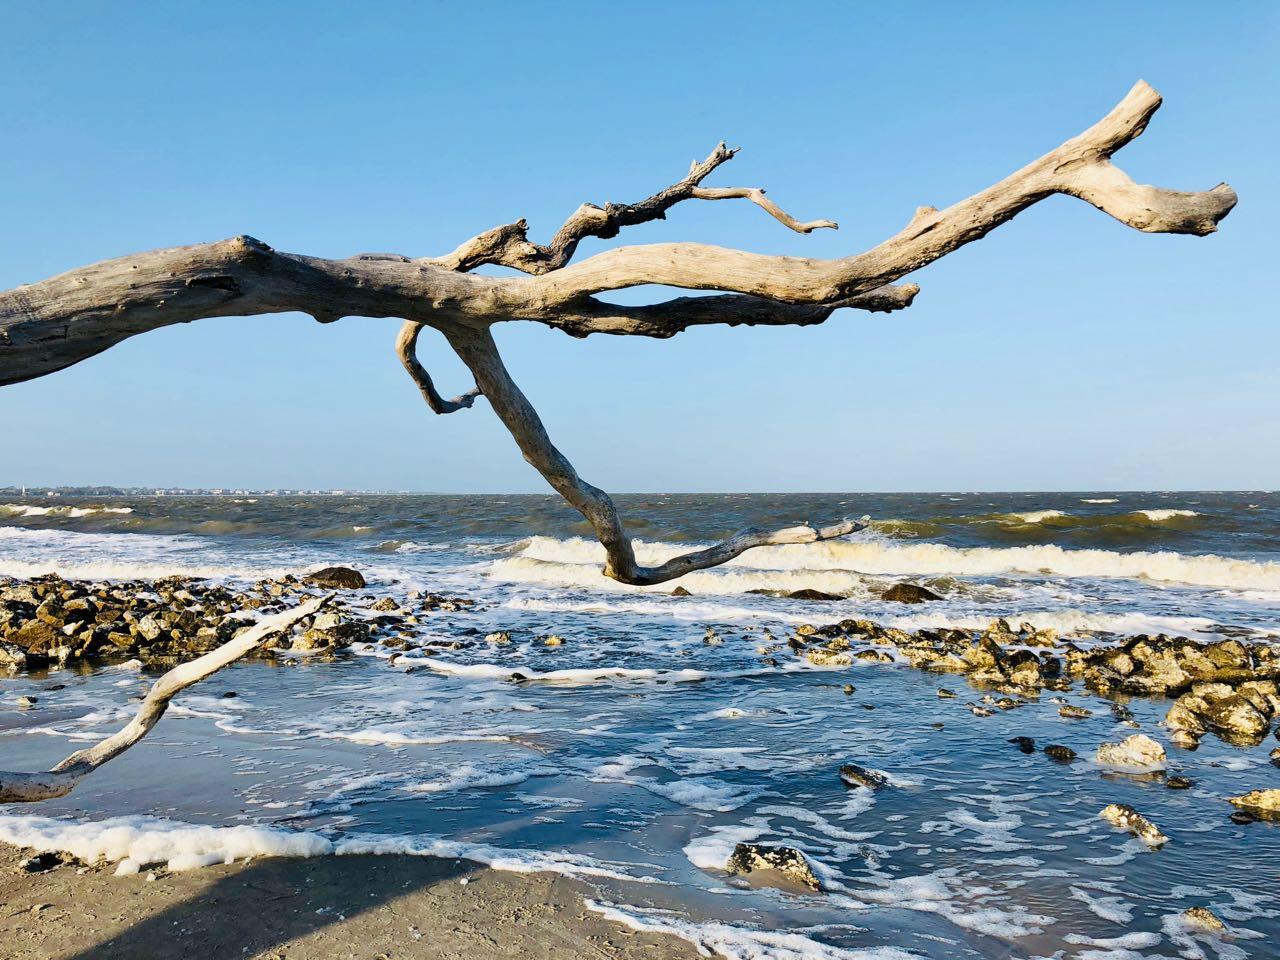 Jekyll island Driftwood beach biking trail